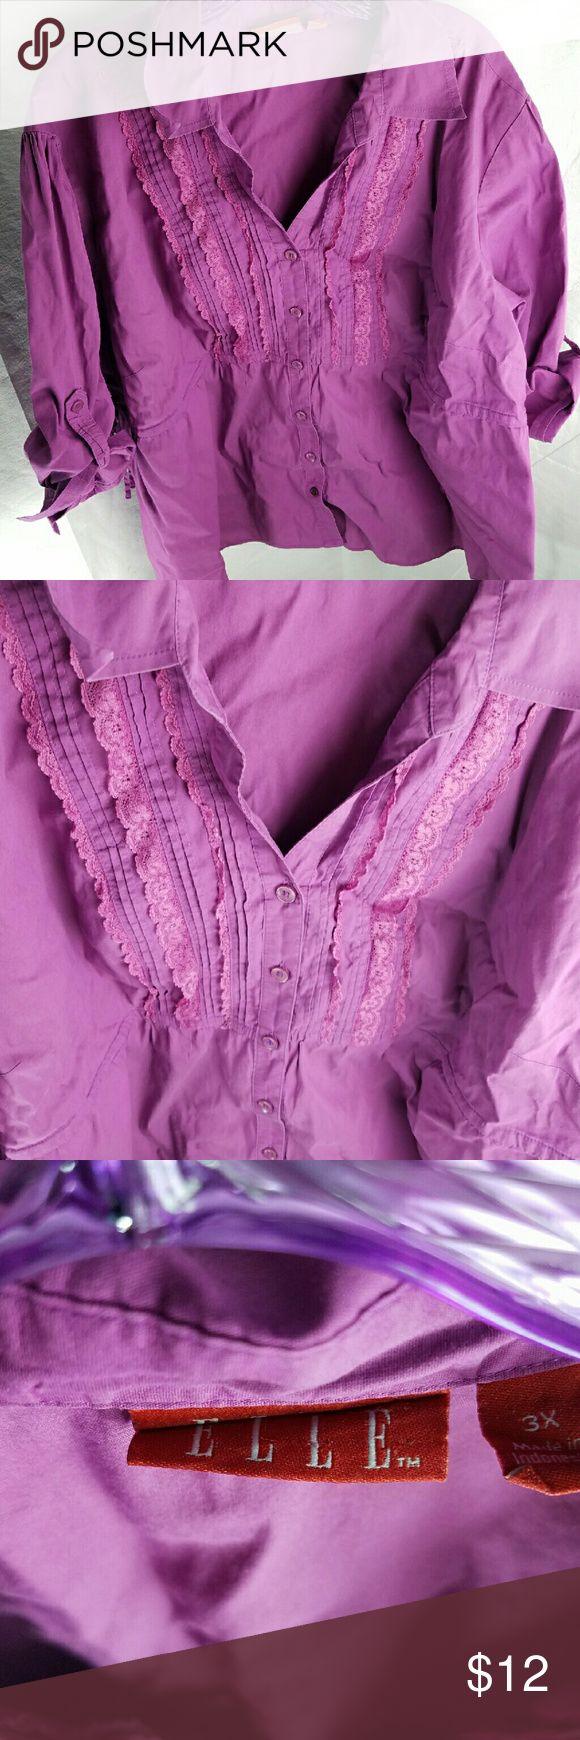 Elle 3X Purple Blouse Elle 3XL Purple 3/4 Sleeve Blouse ties in back length is 26.75 bust is 47in armpit to armpit is 25in from shoulder to end of sleeve is 12in Elle Tops Blouses